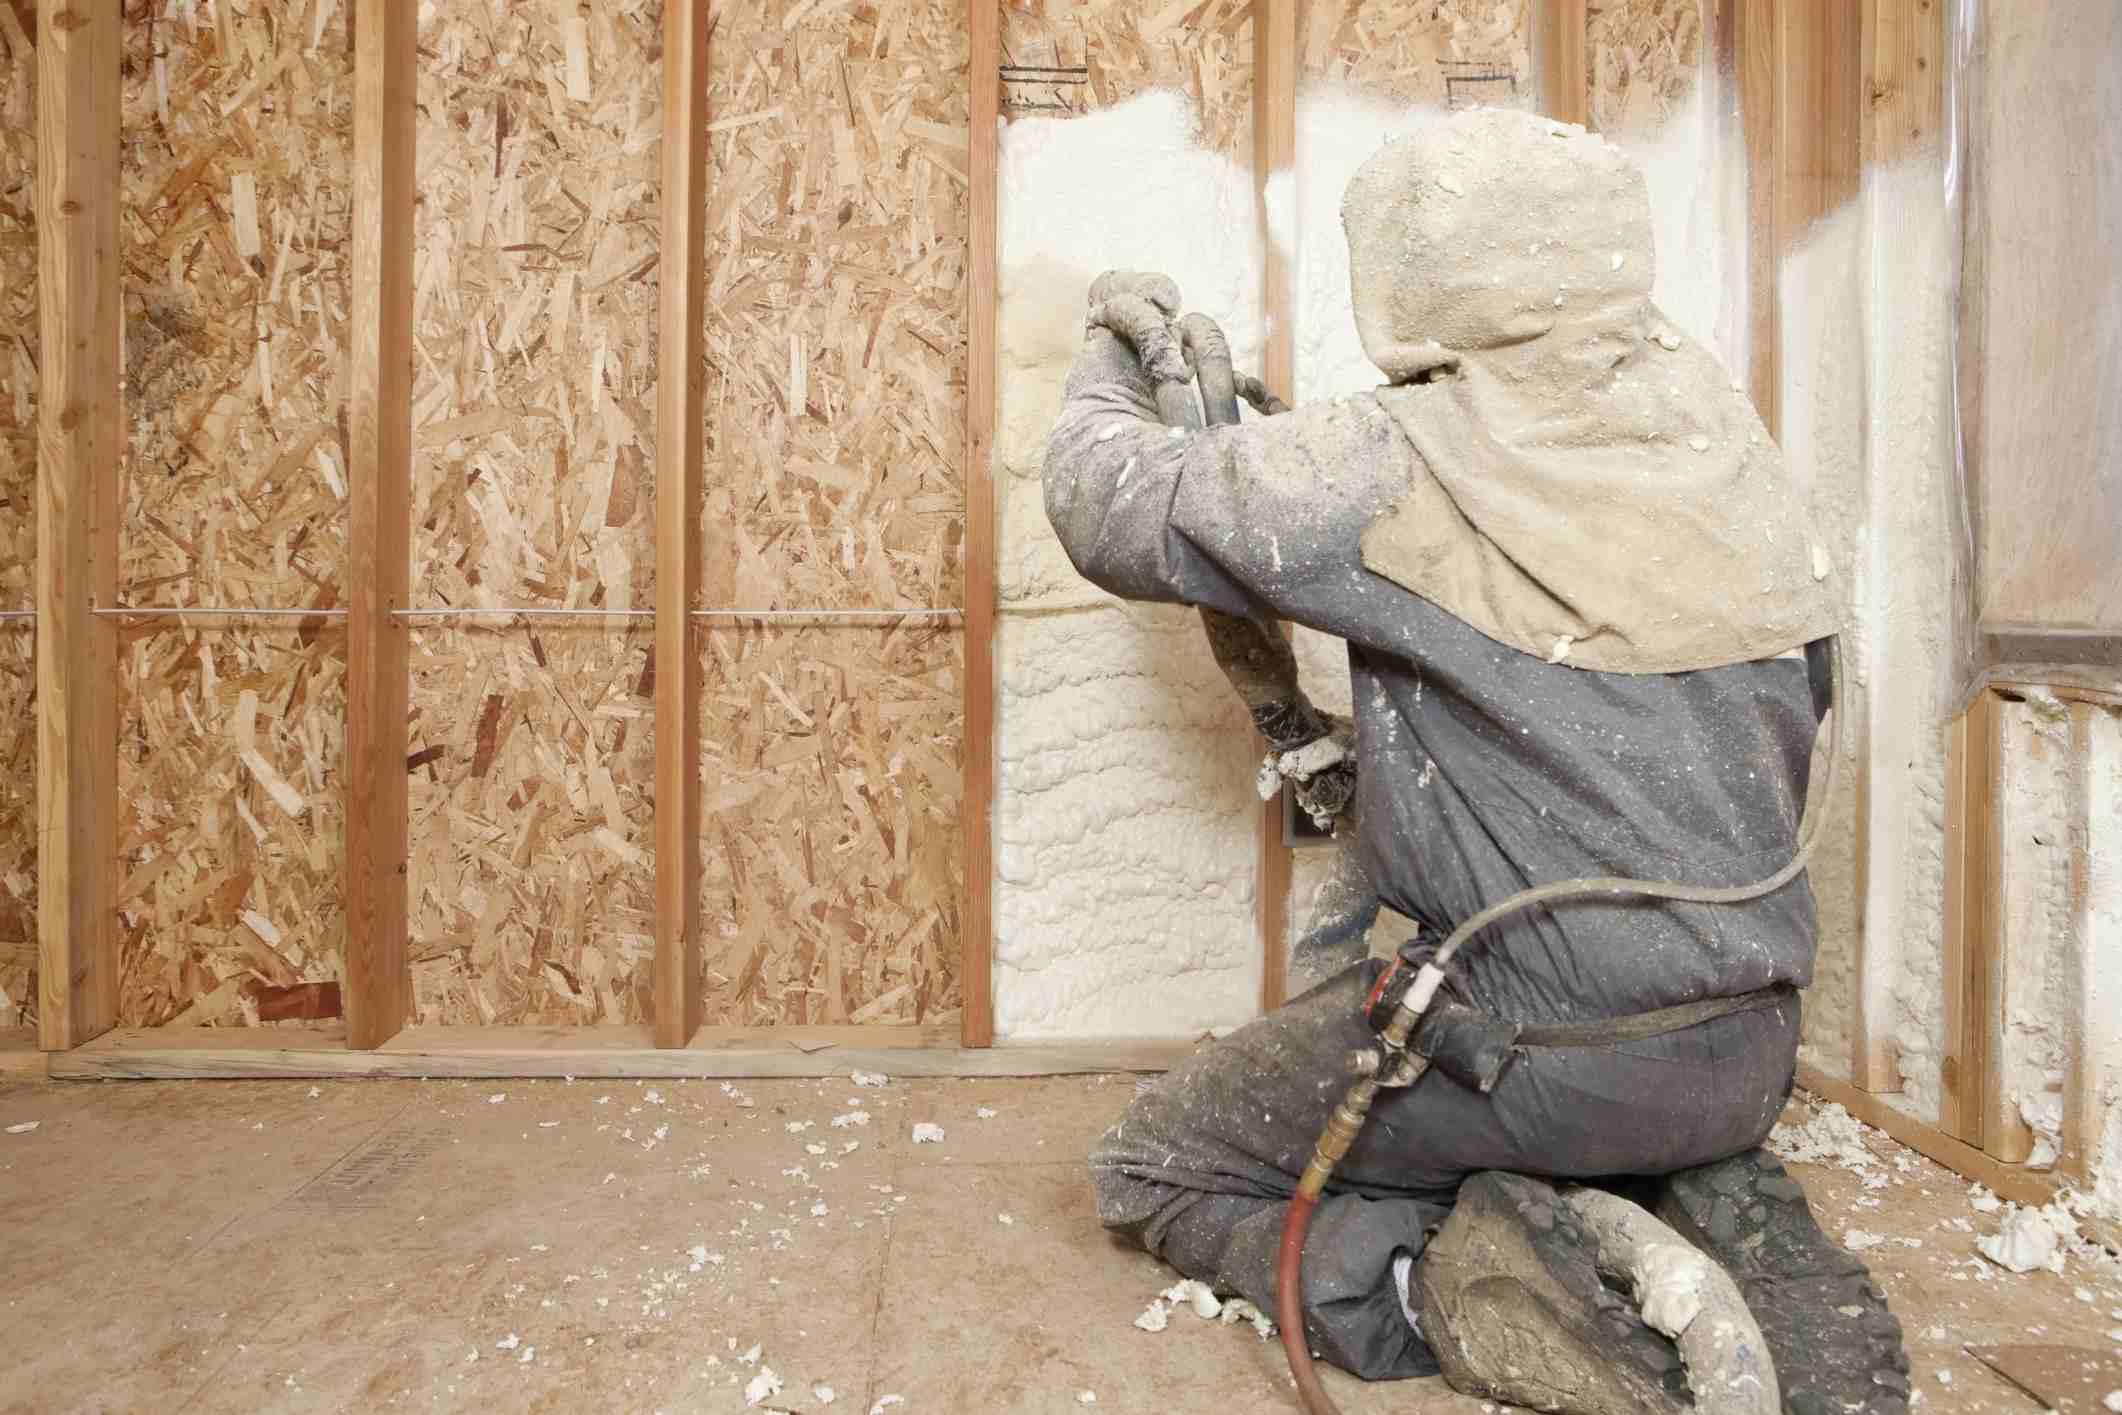 Spraying foam insulation into the wall